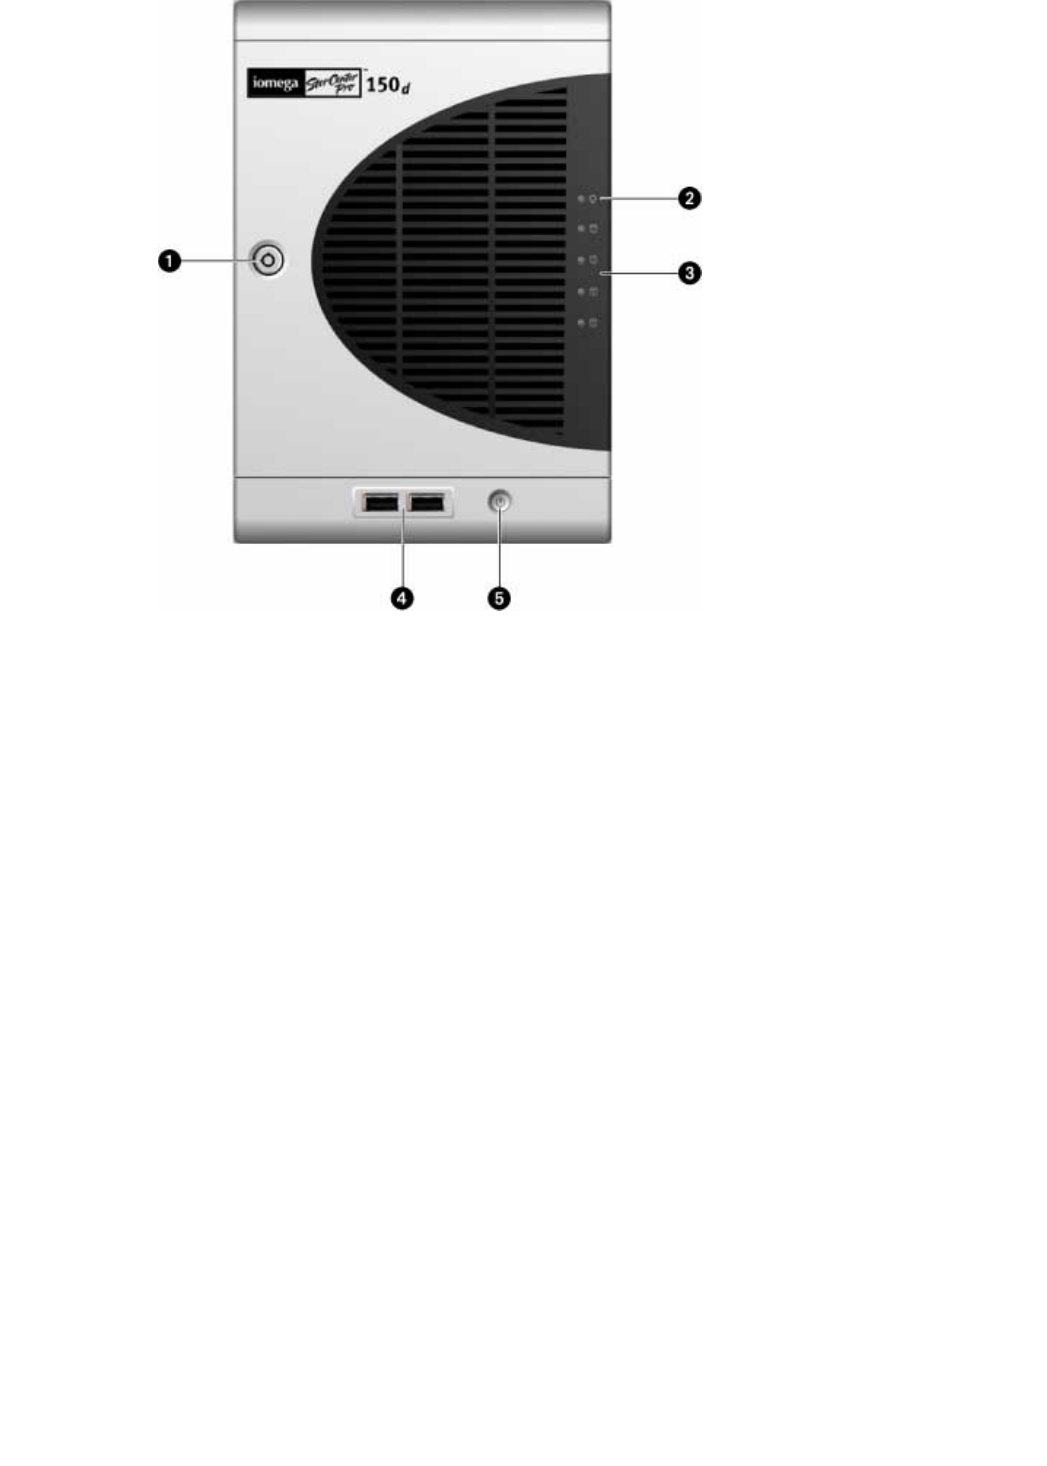 handleiding iomega storcenter pro nas 150d server pagina 5 van 70 rh gebruikershandleiding com iomega nas 150d manual iomega storcenter 150d reset